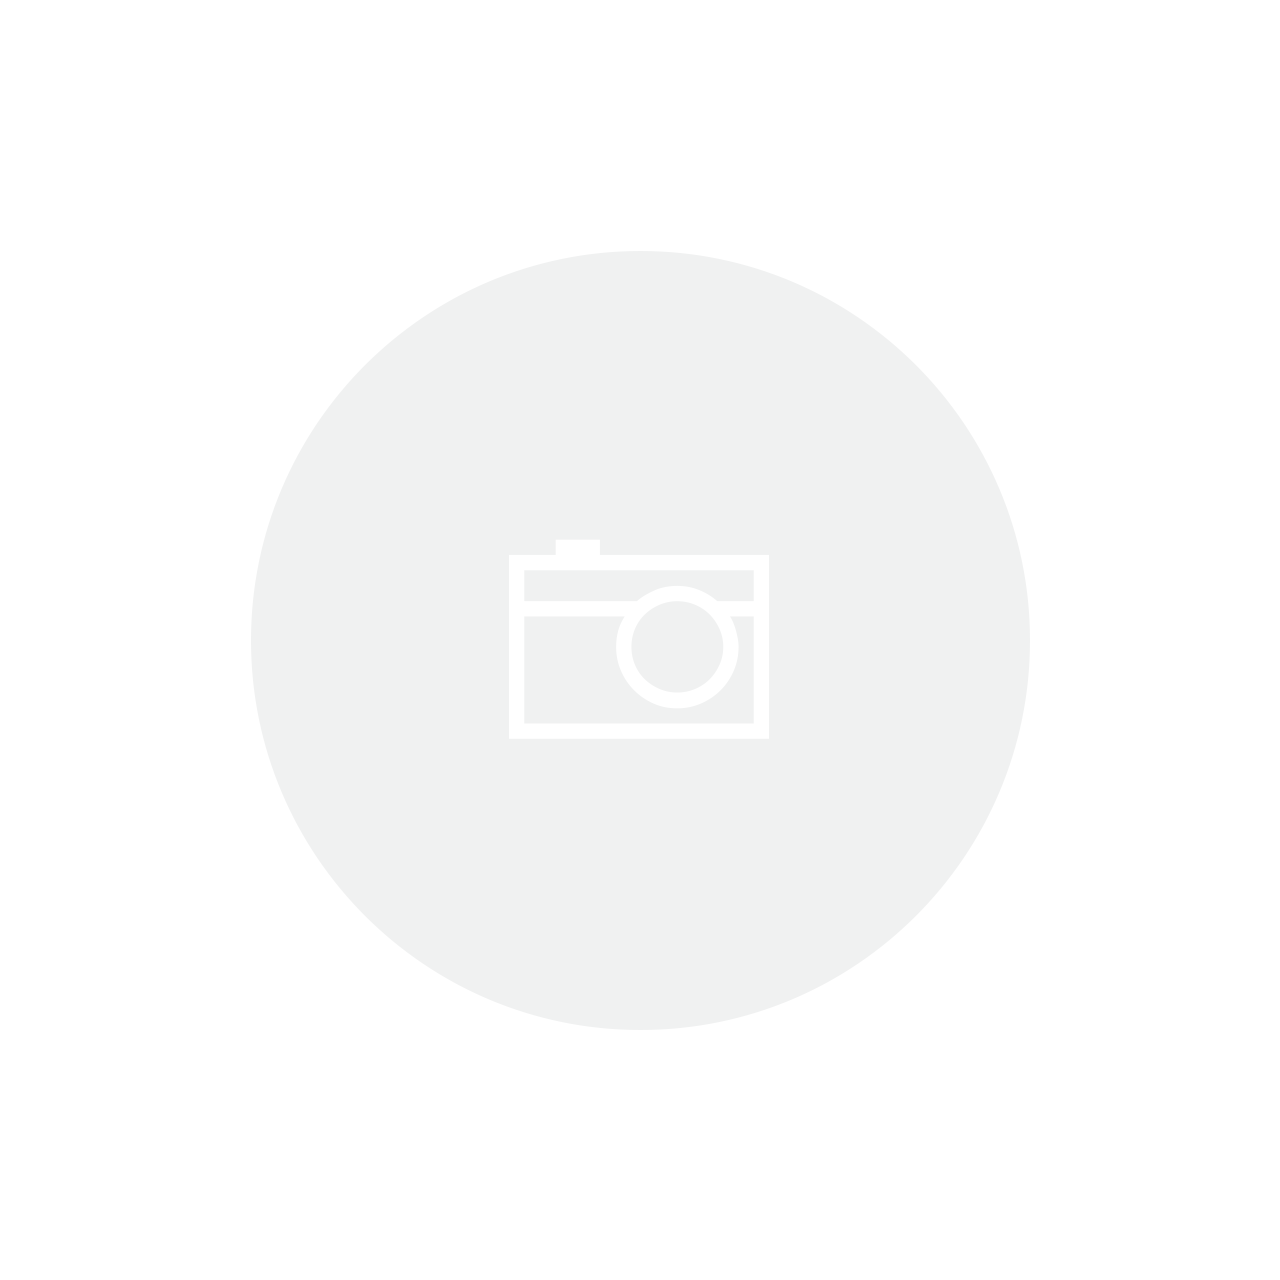 FONE HEADSET RAZER KRAKEN 7.1 CHROMA - RZ04-01250100-R3U1 - BOX